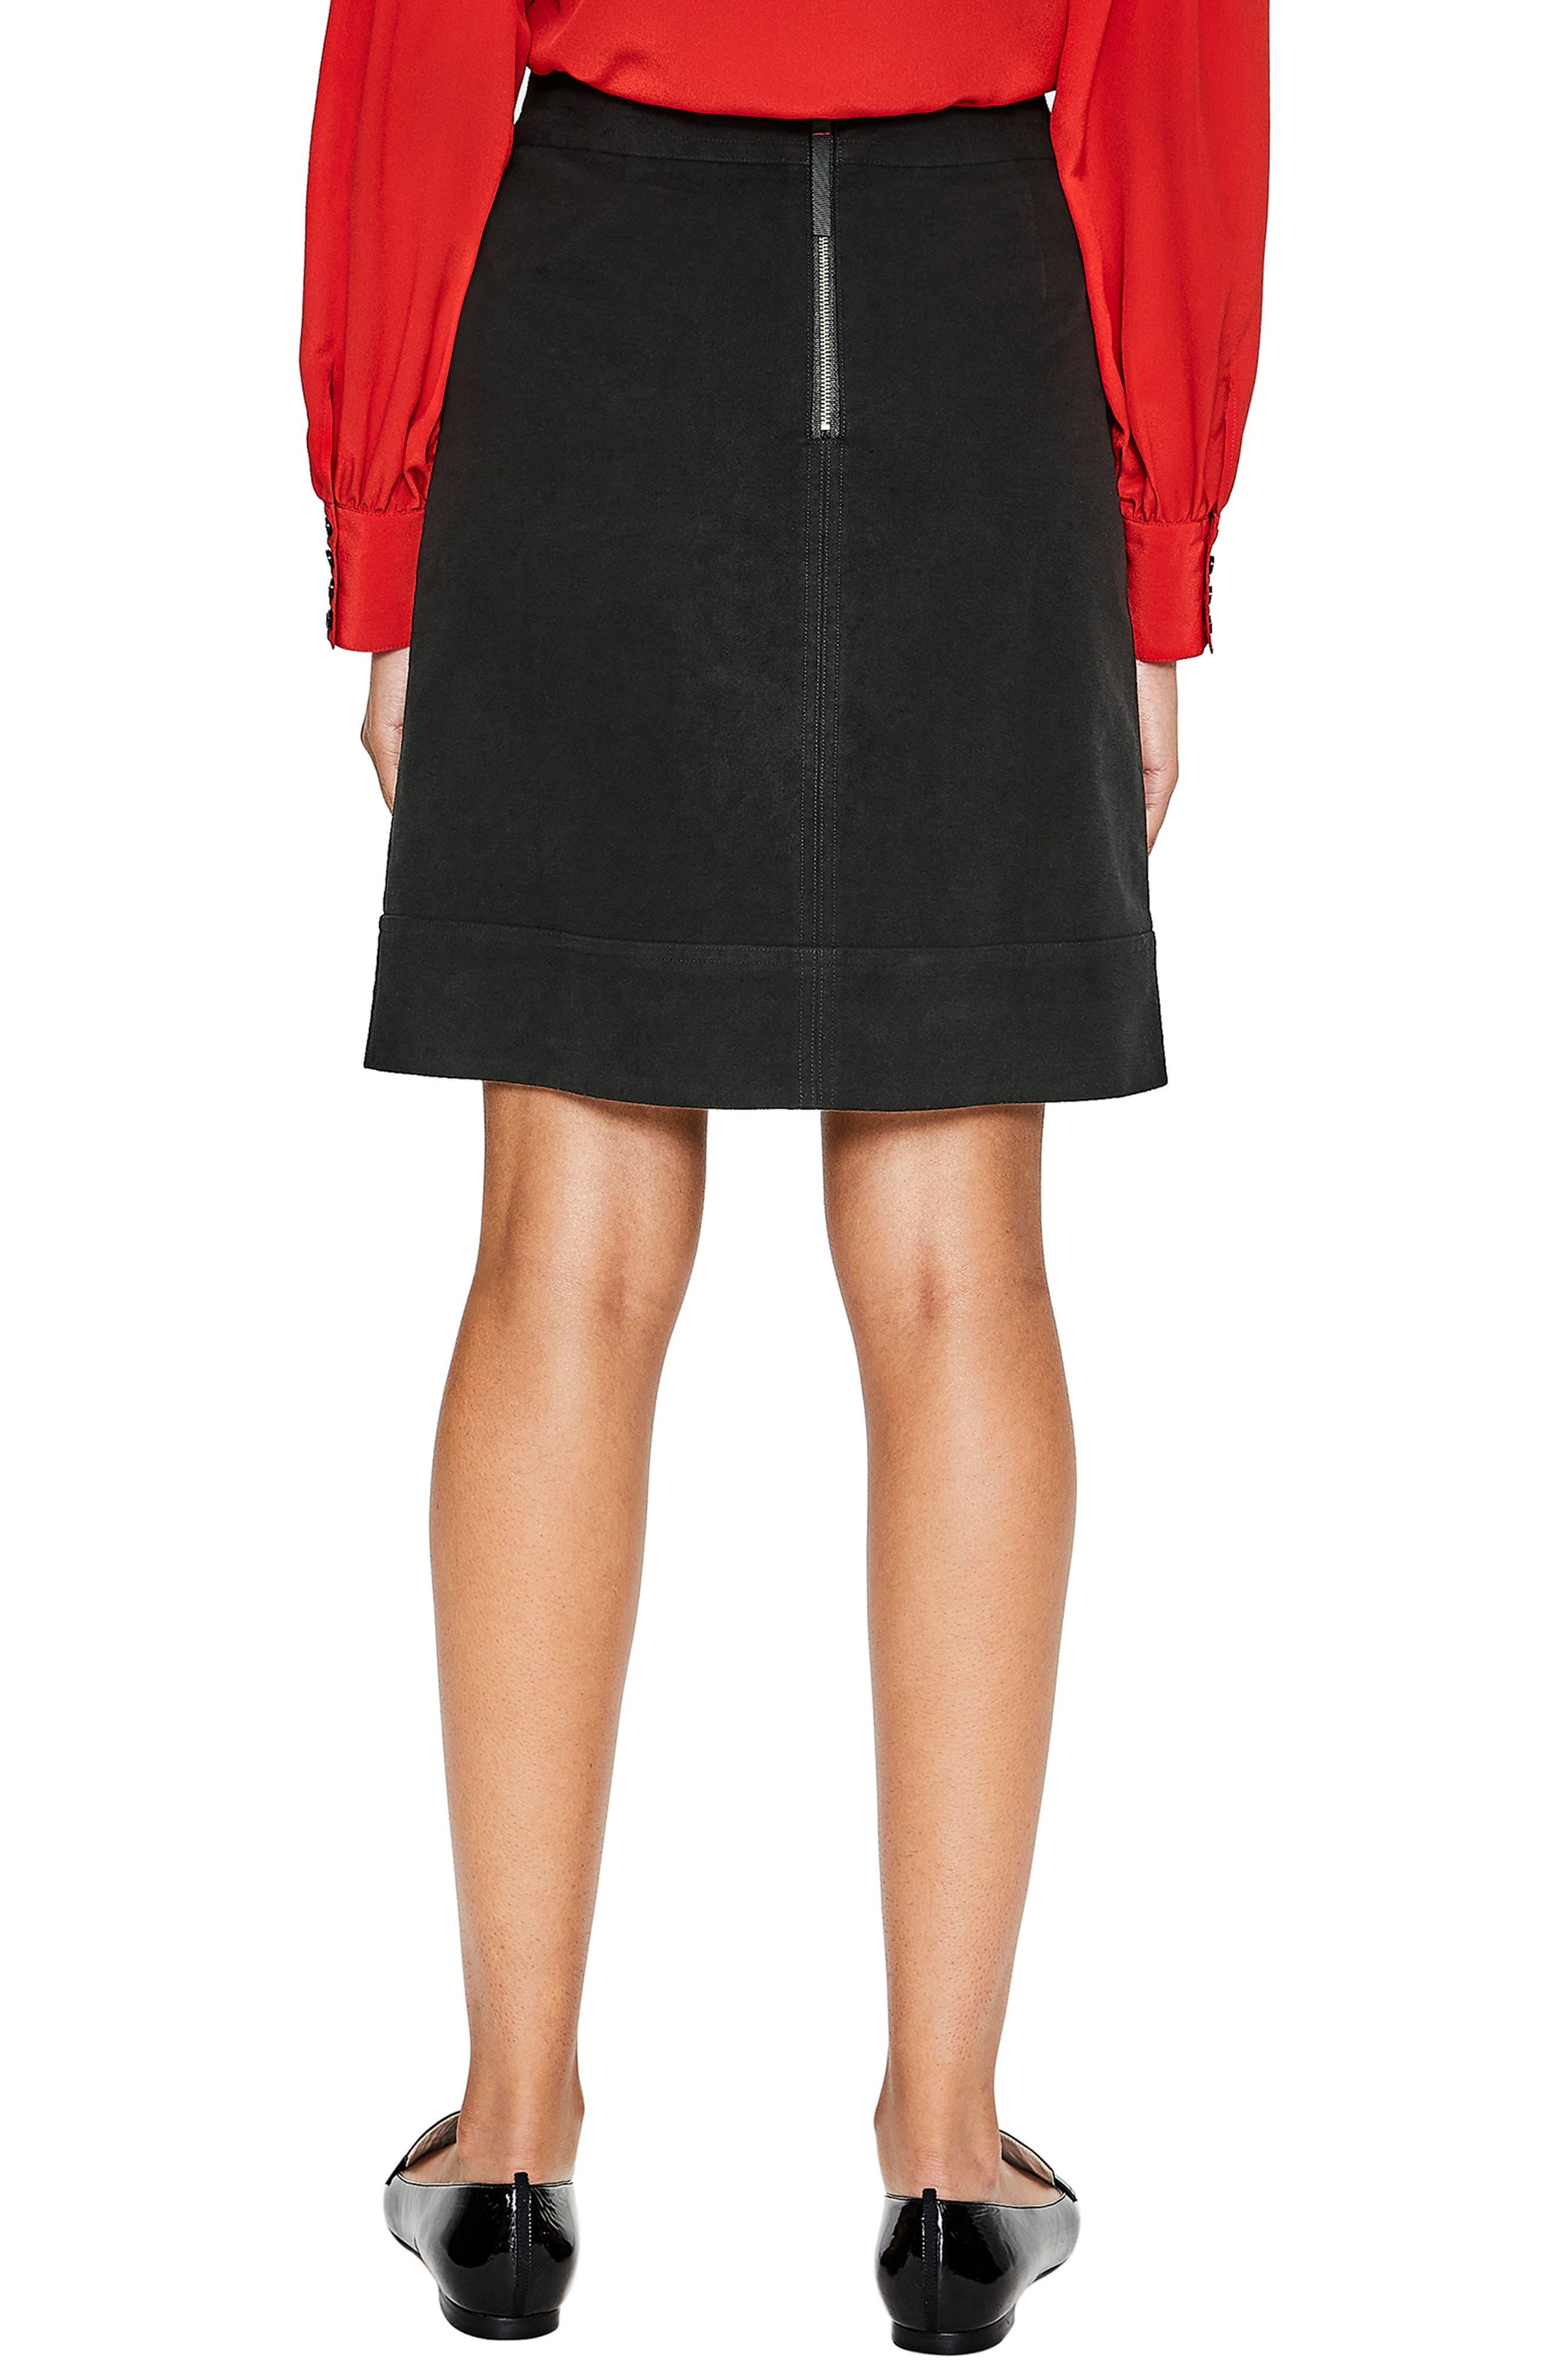 BODEN,                             Dorchester Patch Pocket Stretch Cotton Miniskirt,                             Alternate thumbnail 2, color,                             001